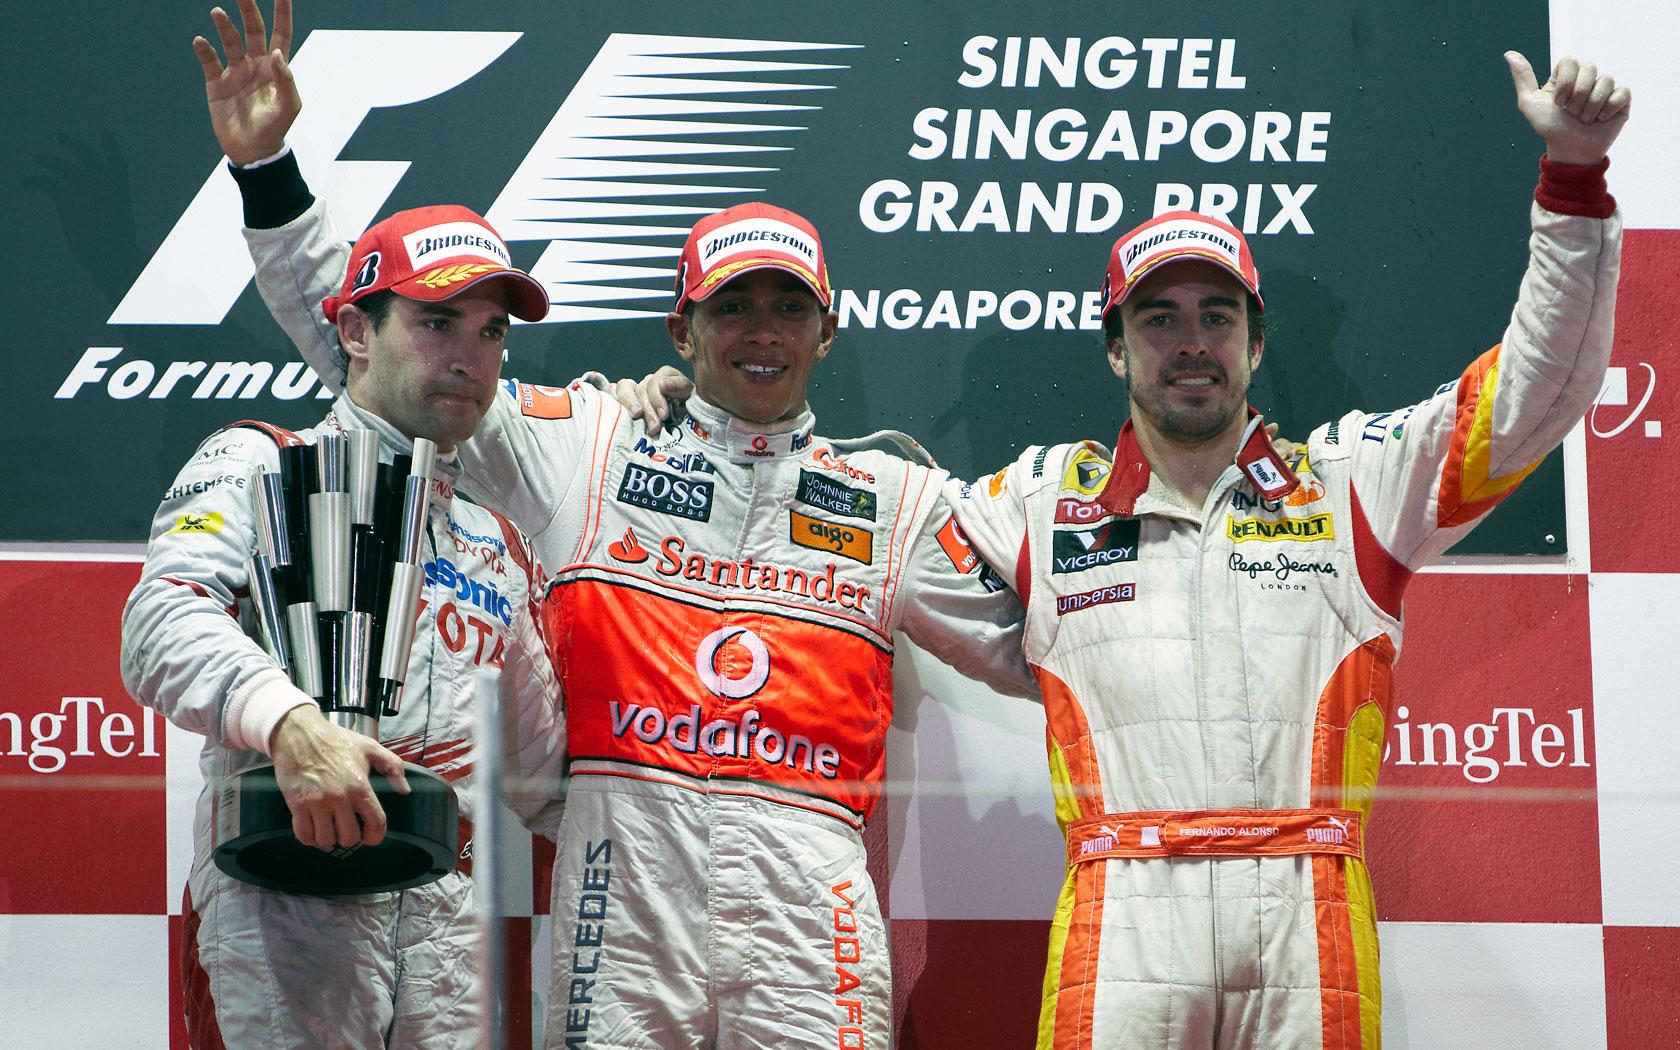 Hd Wallpapers 2009 Formula 1 Grand Prix Of Singapore F1